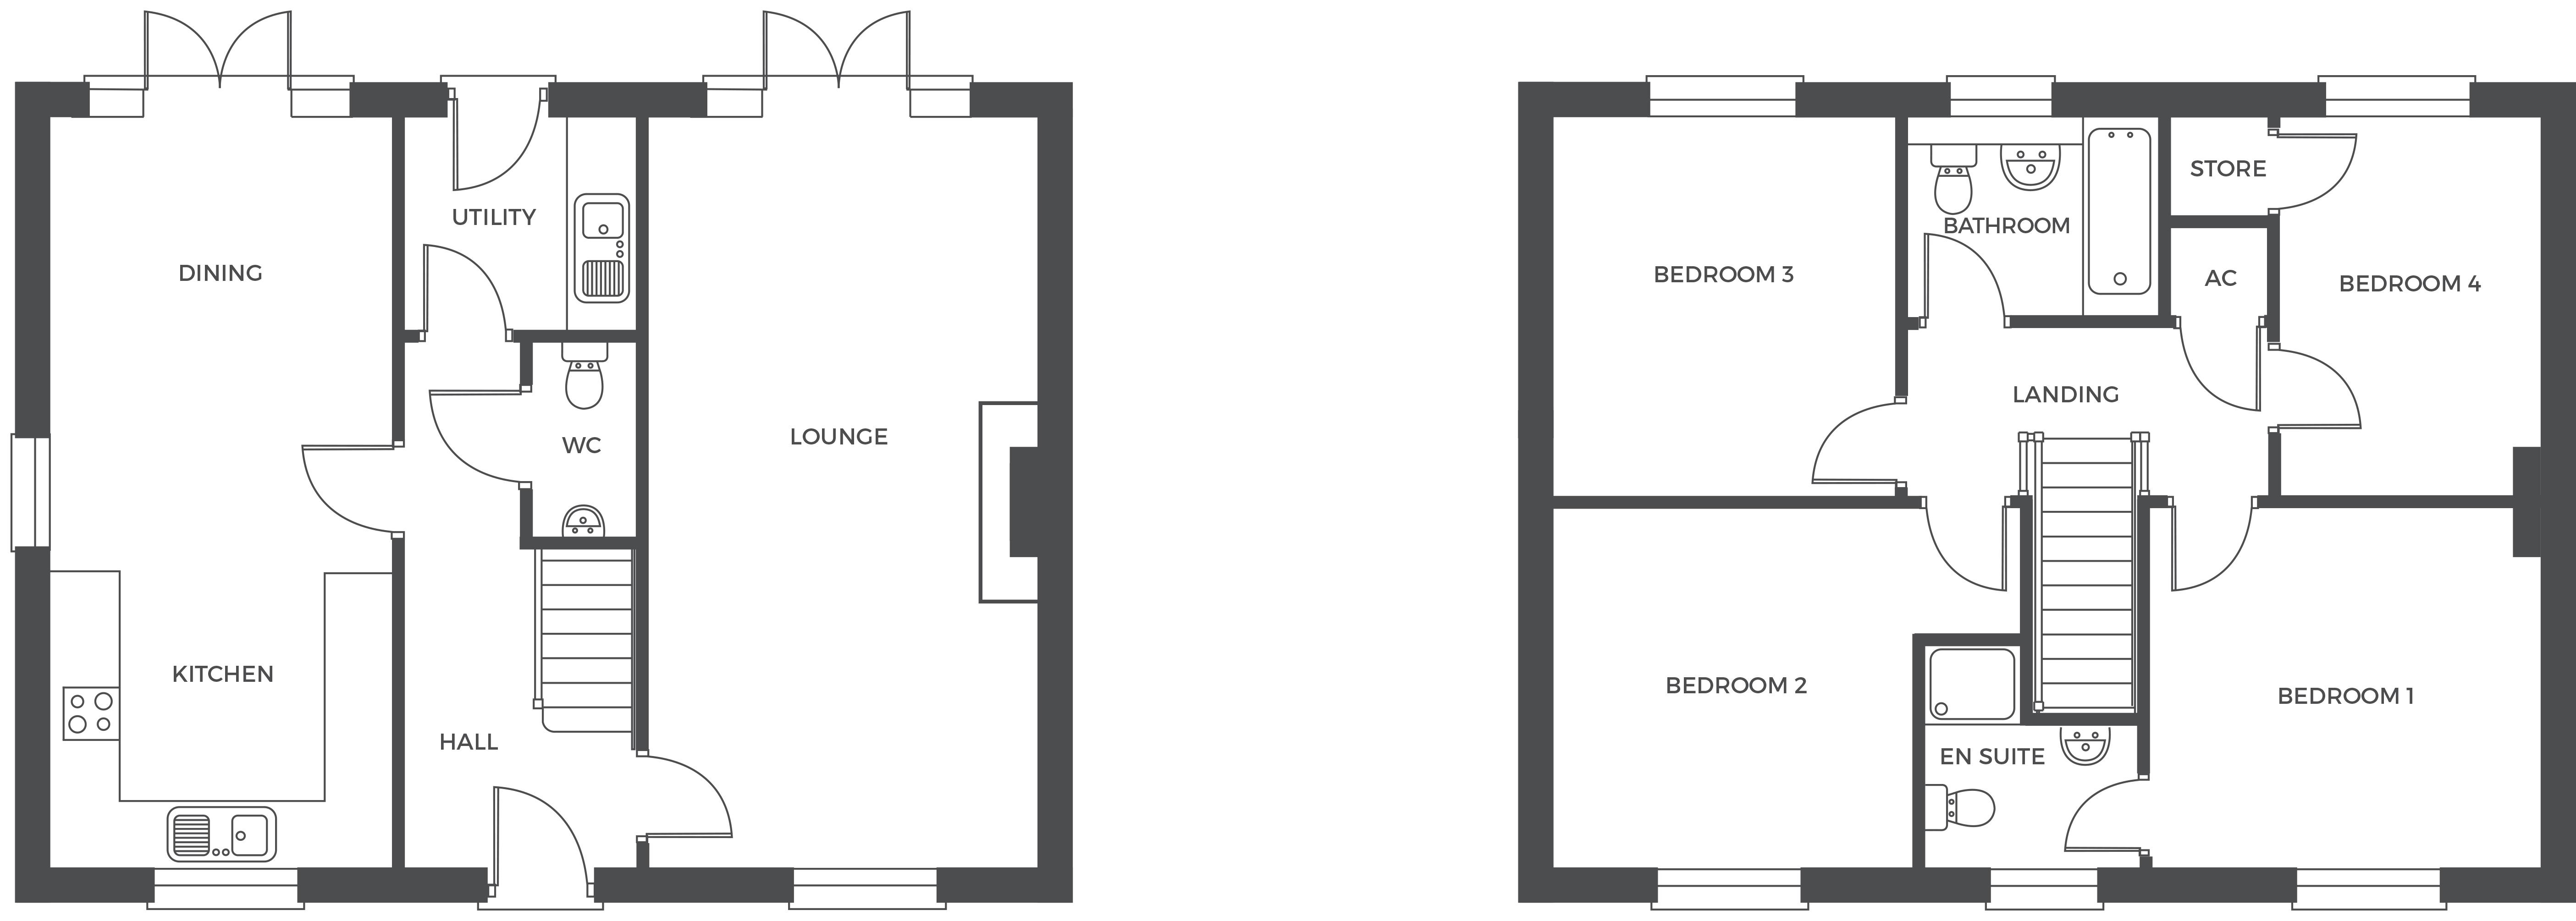 Walton Croft, Plot 6 floor plan